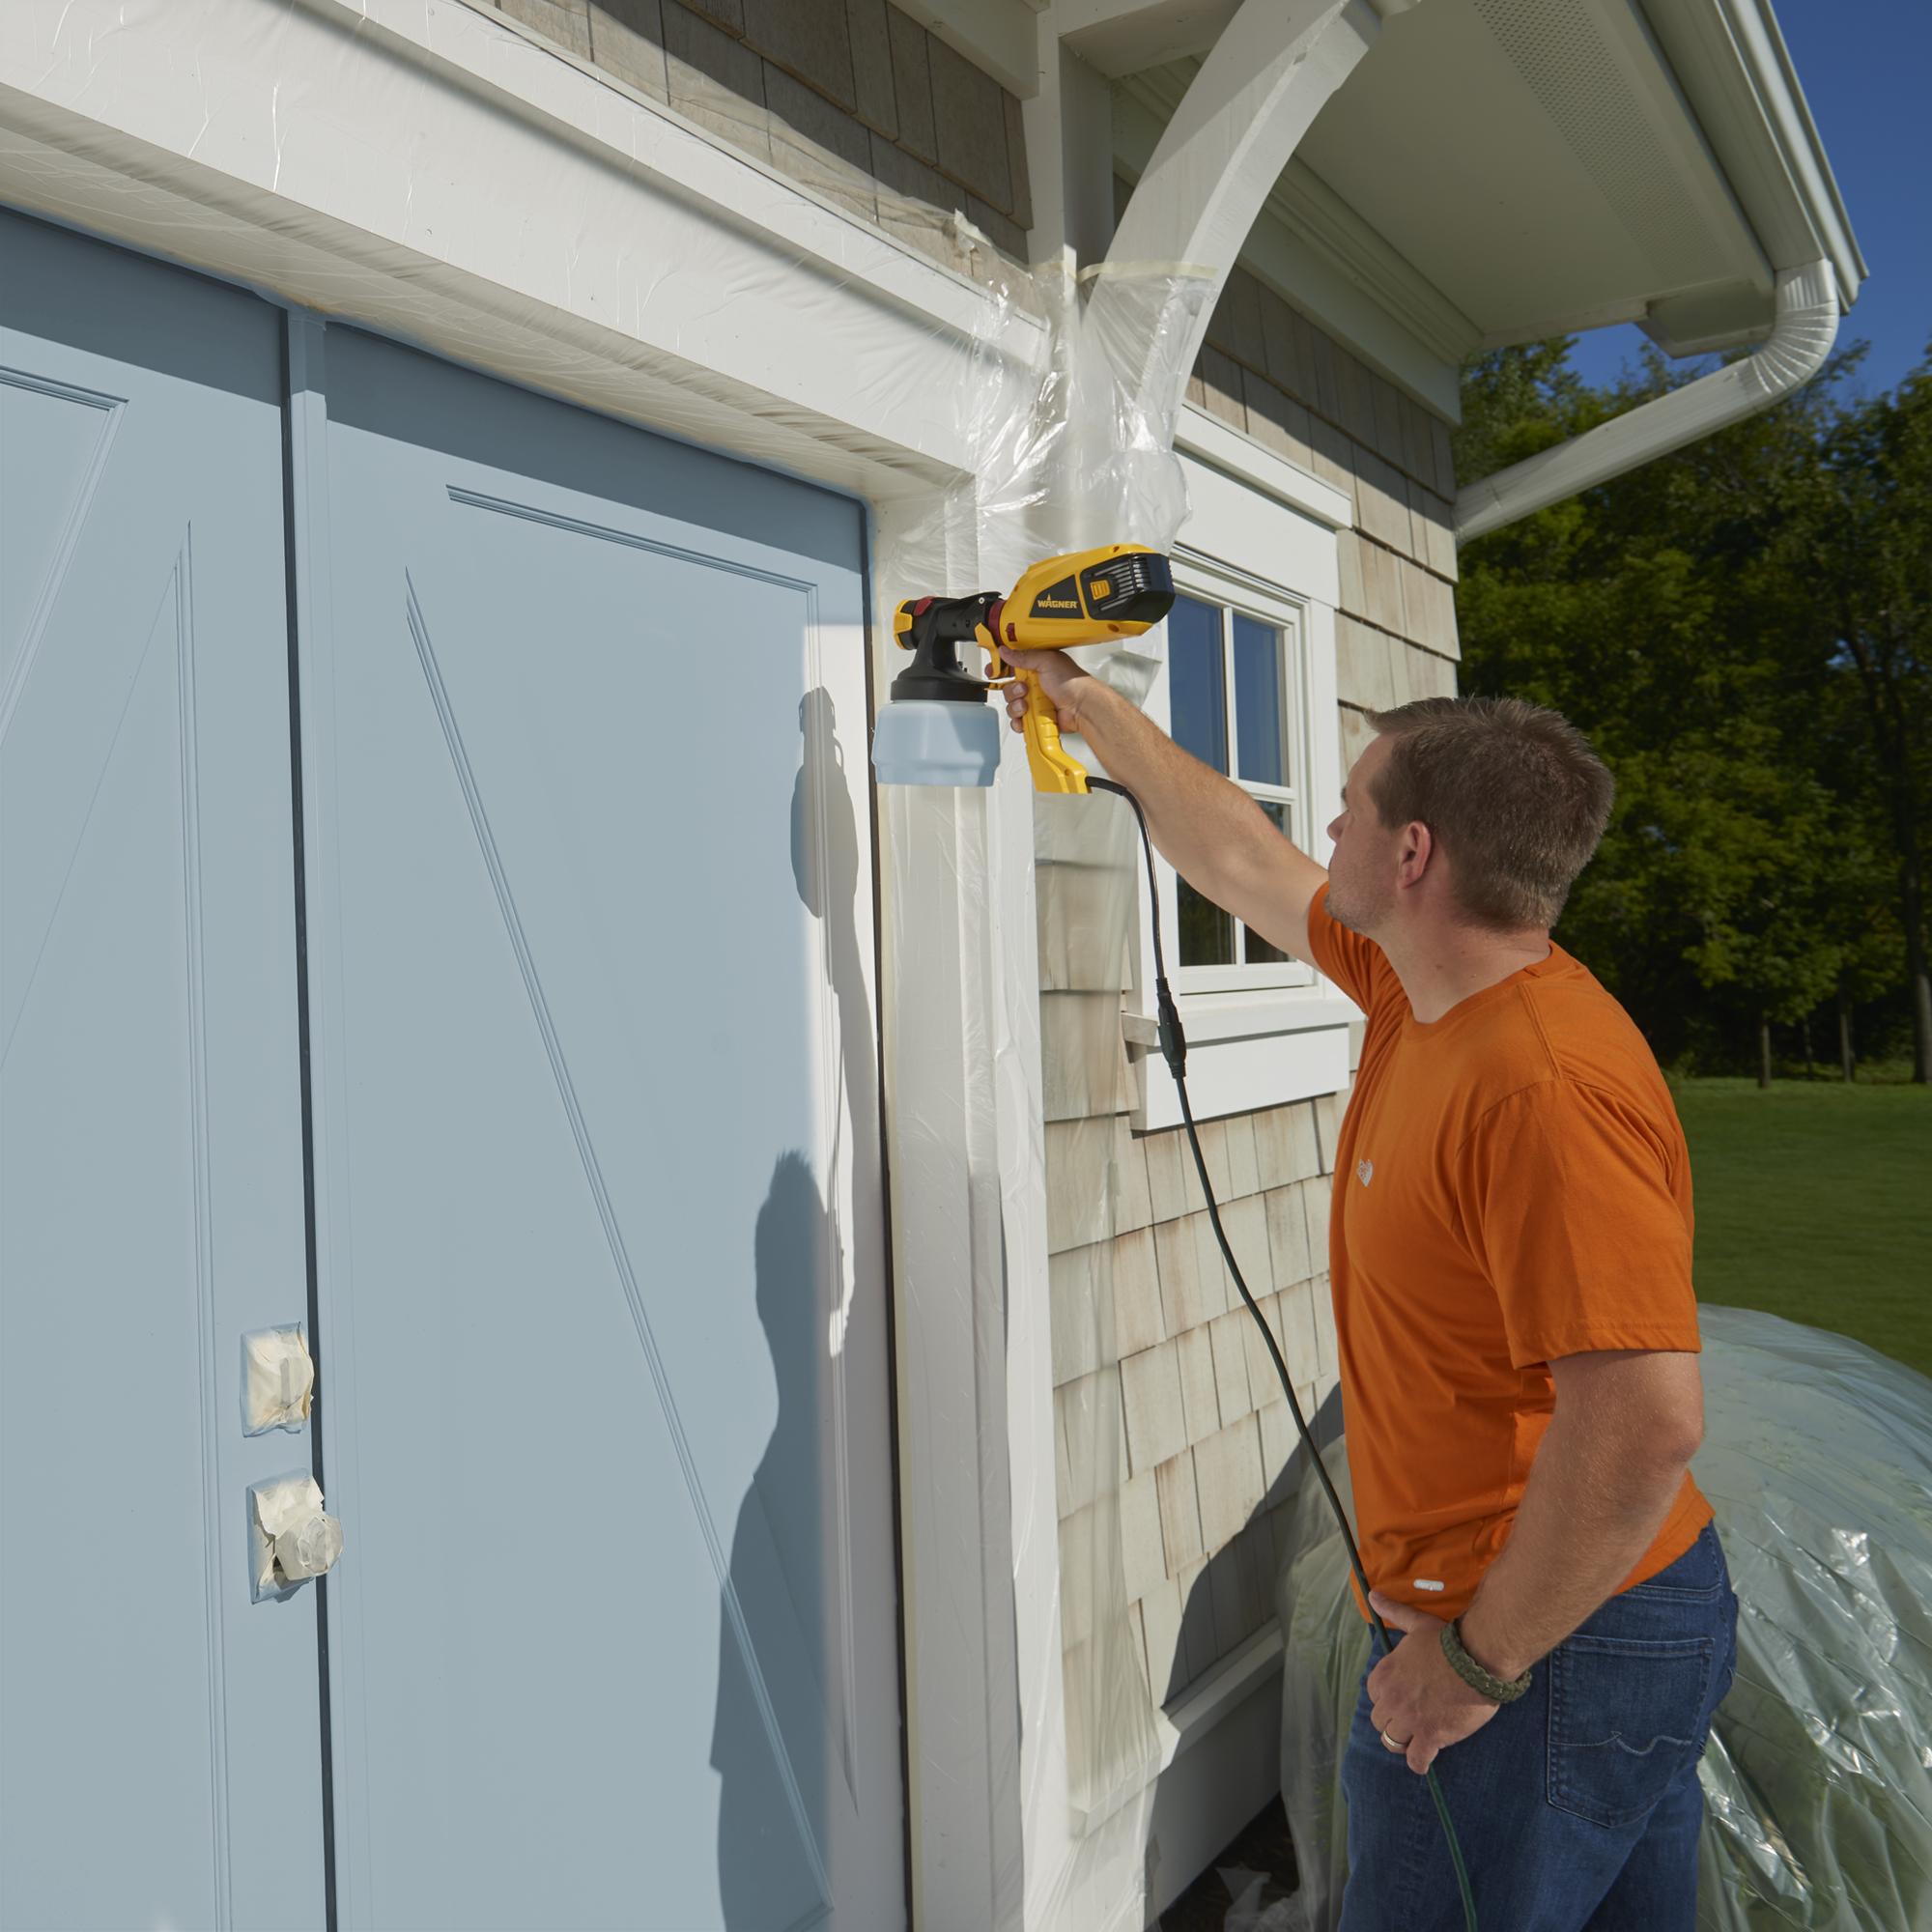 Control Painter Sprayer | Wagner SprayTech